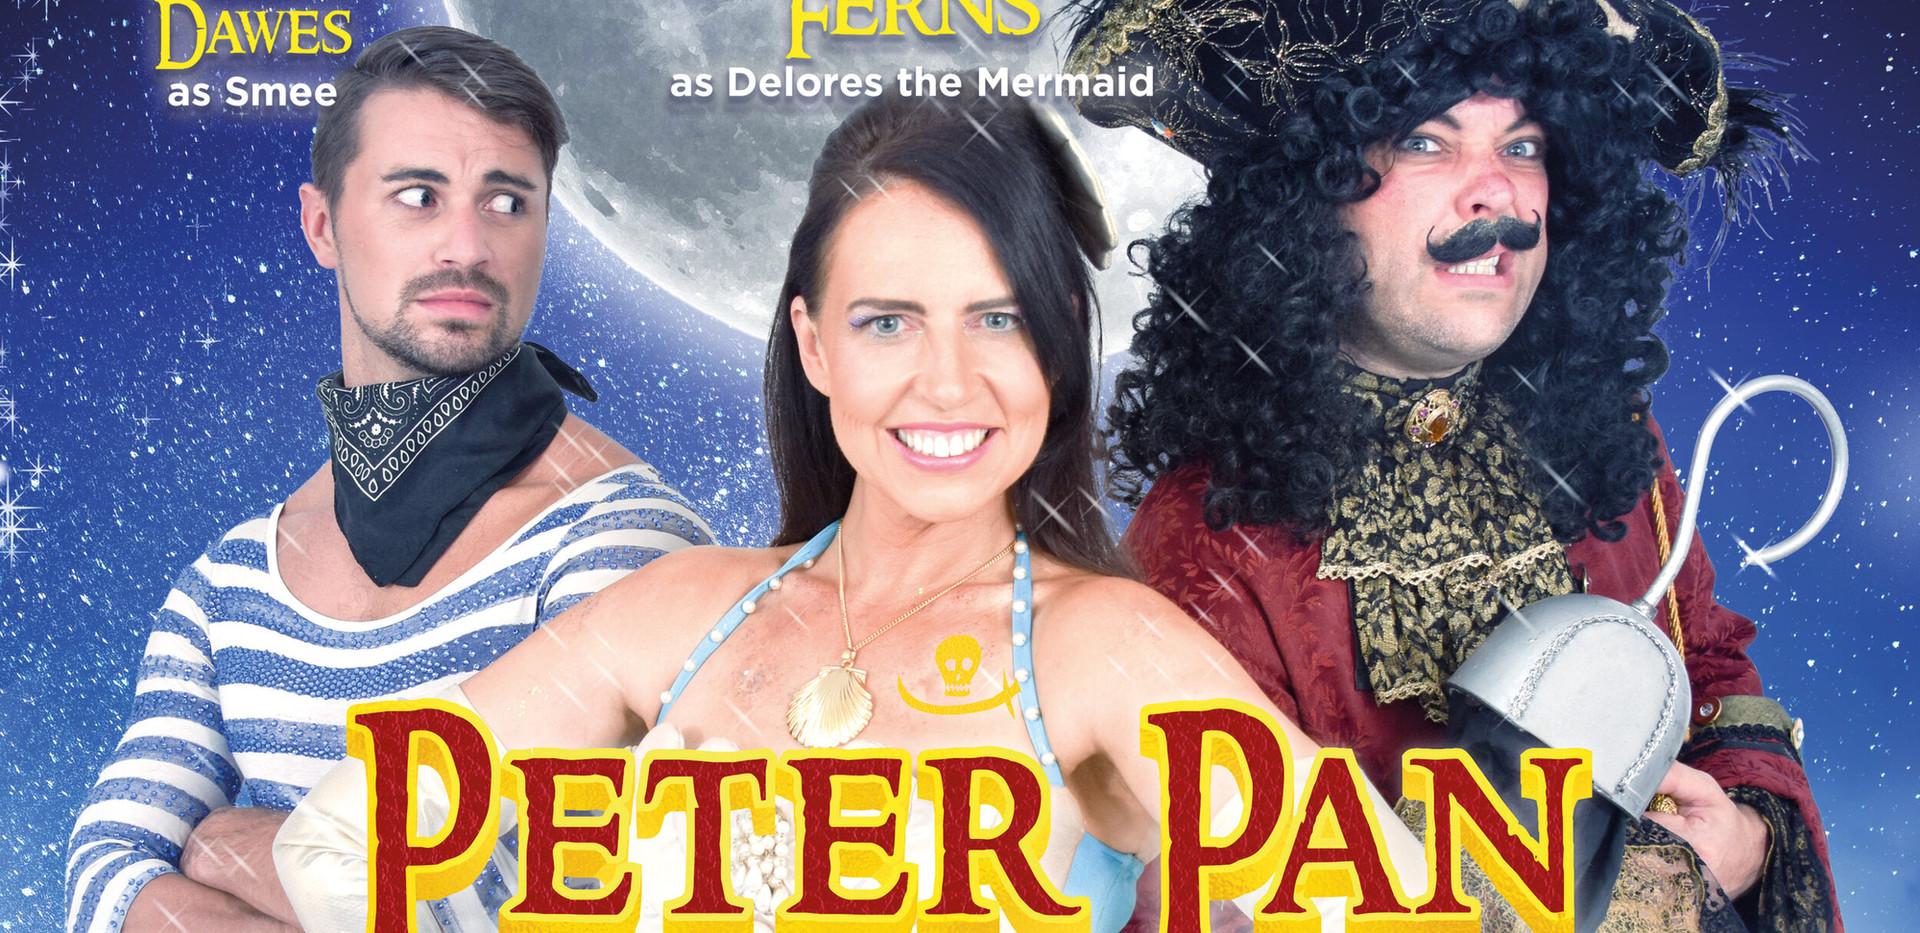 Peter Pan @ Brighton Hilton Metropole